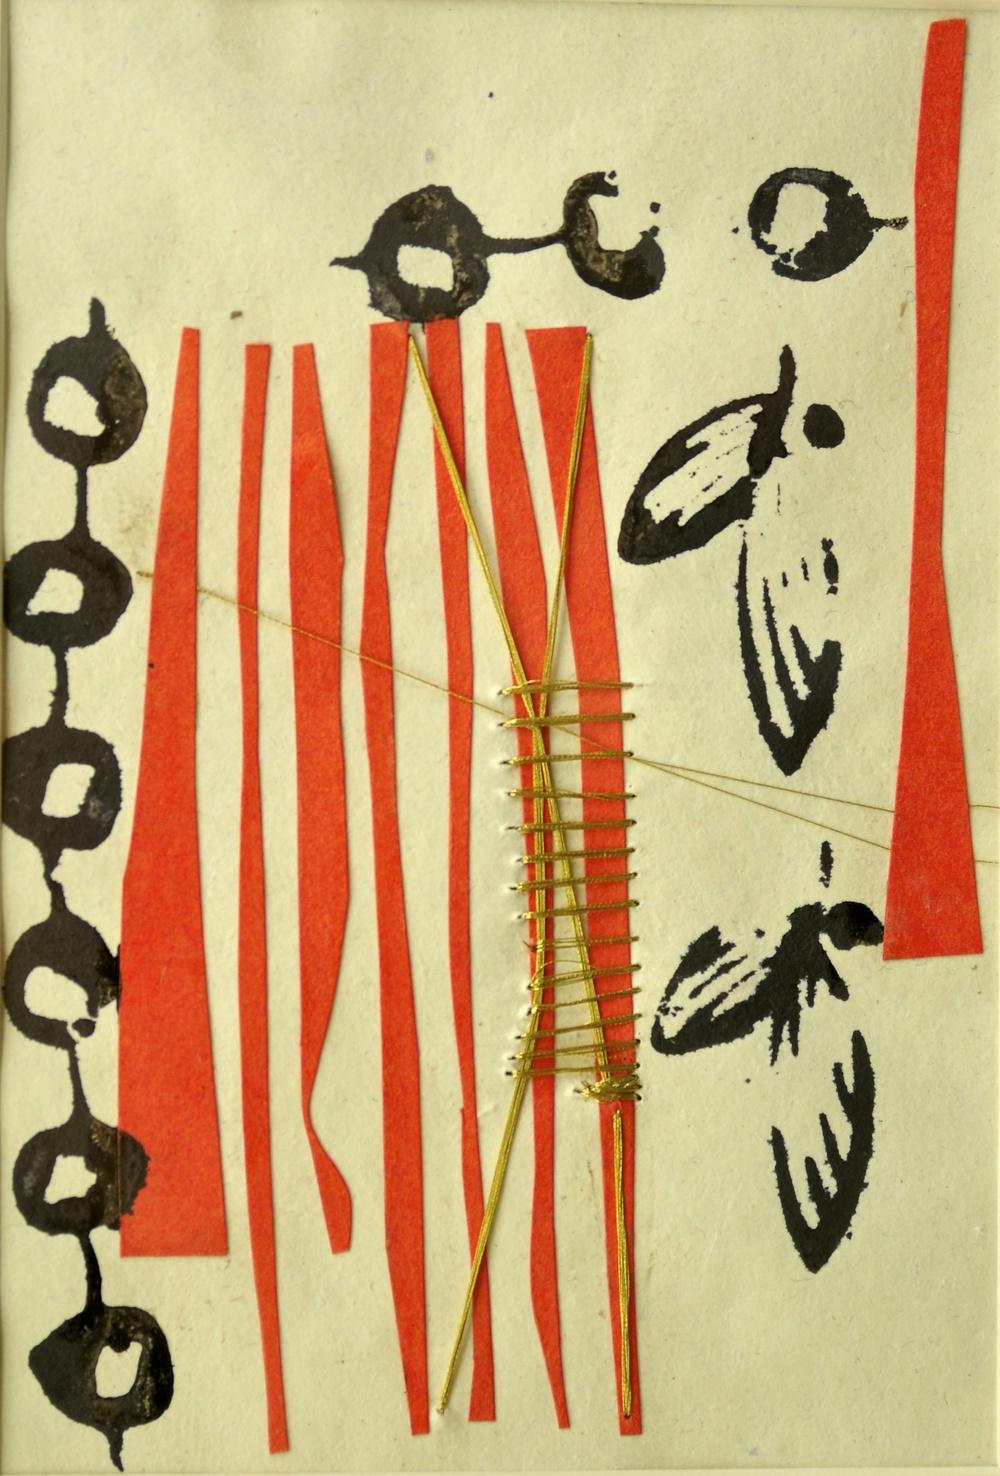 "'Benarsi silk thread and lane', handmade paper (Jaipur), silk thread, block print, collage, 14"" x 6.5"", 2013"